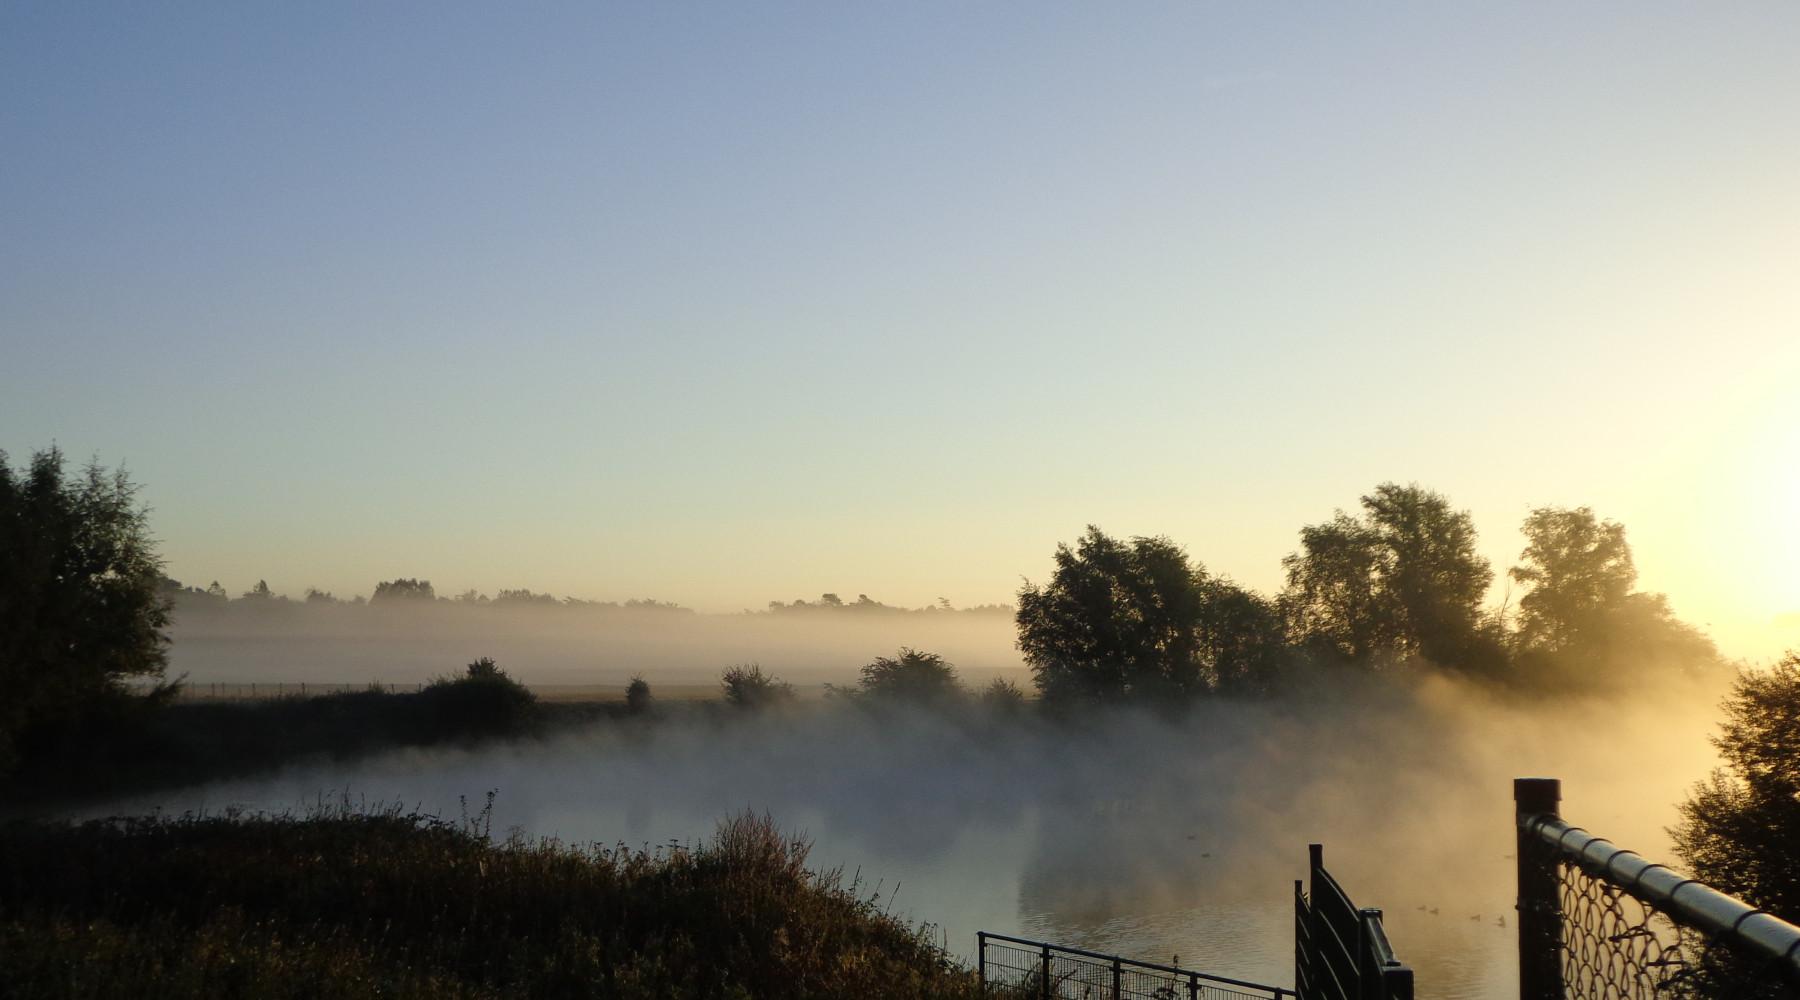 Mist over de Maas Oktober 2016 - 2